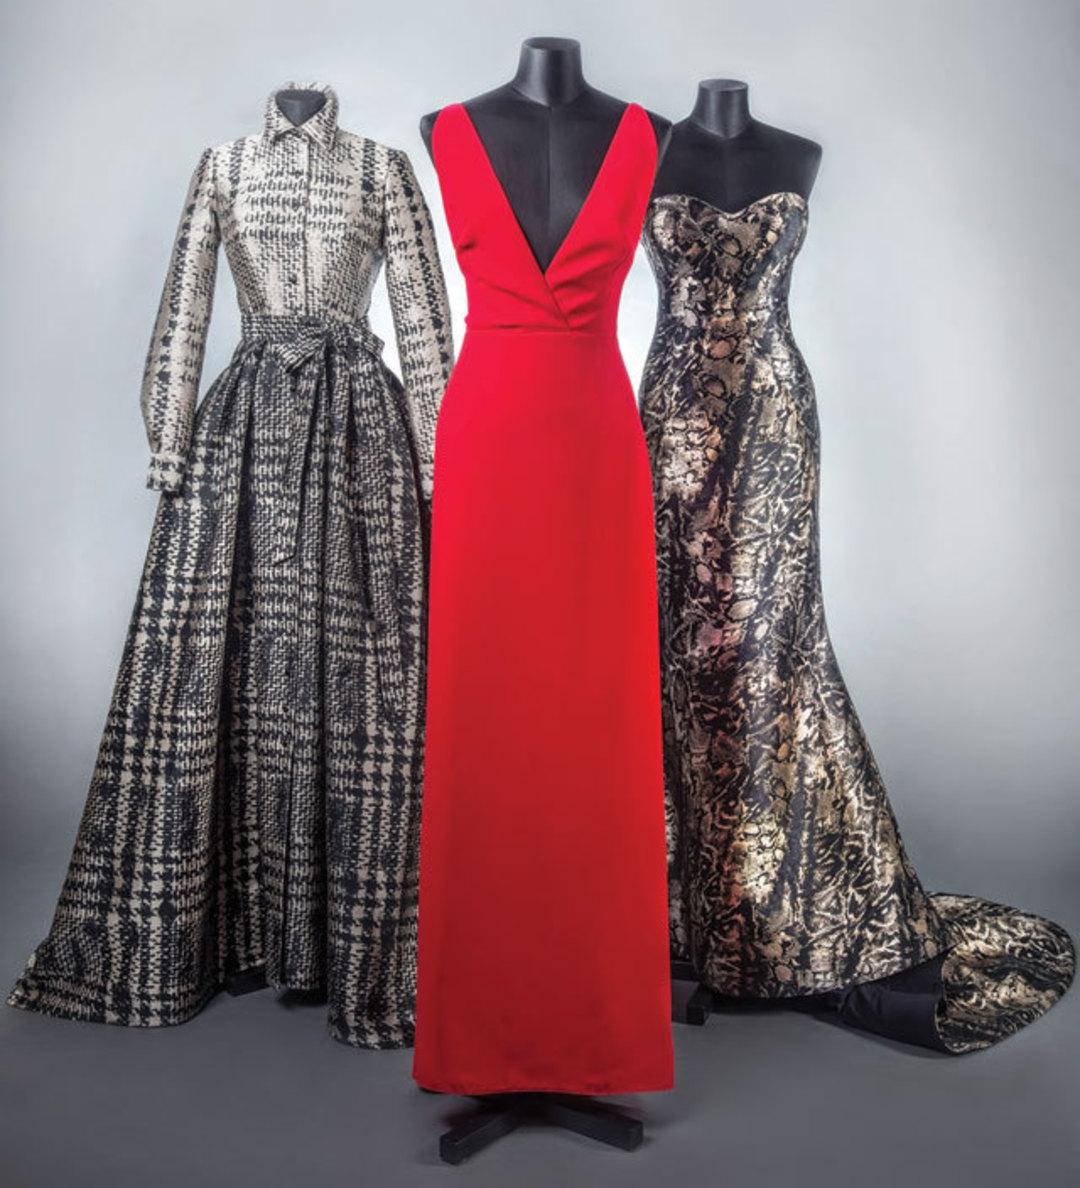 Three Gowns For Gala Season